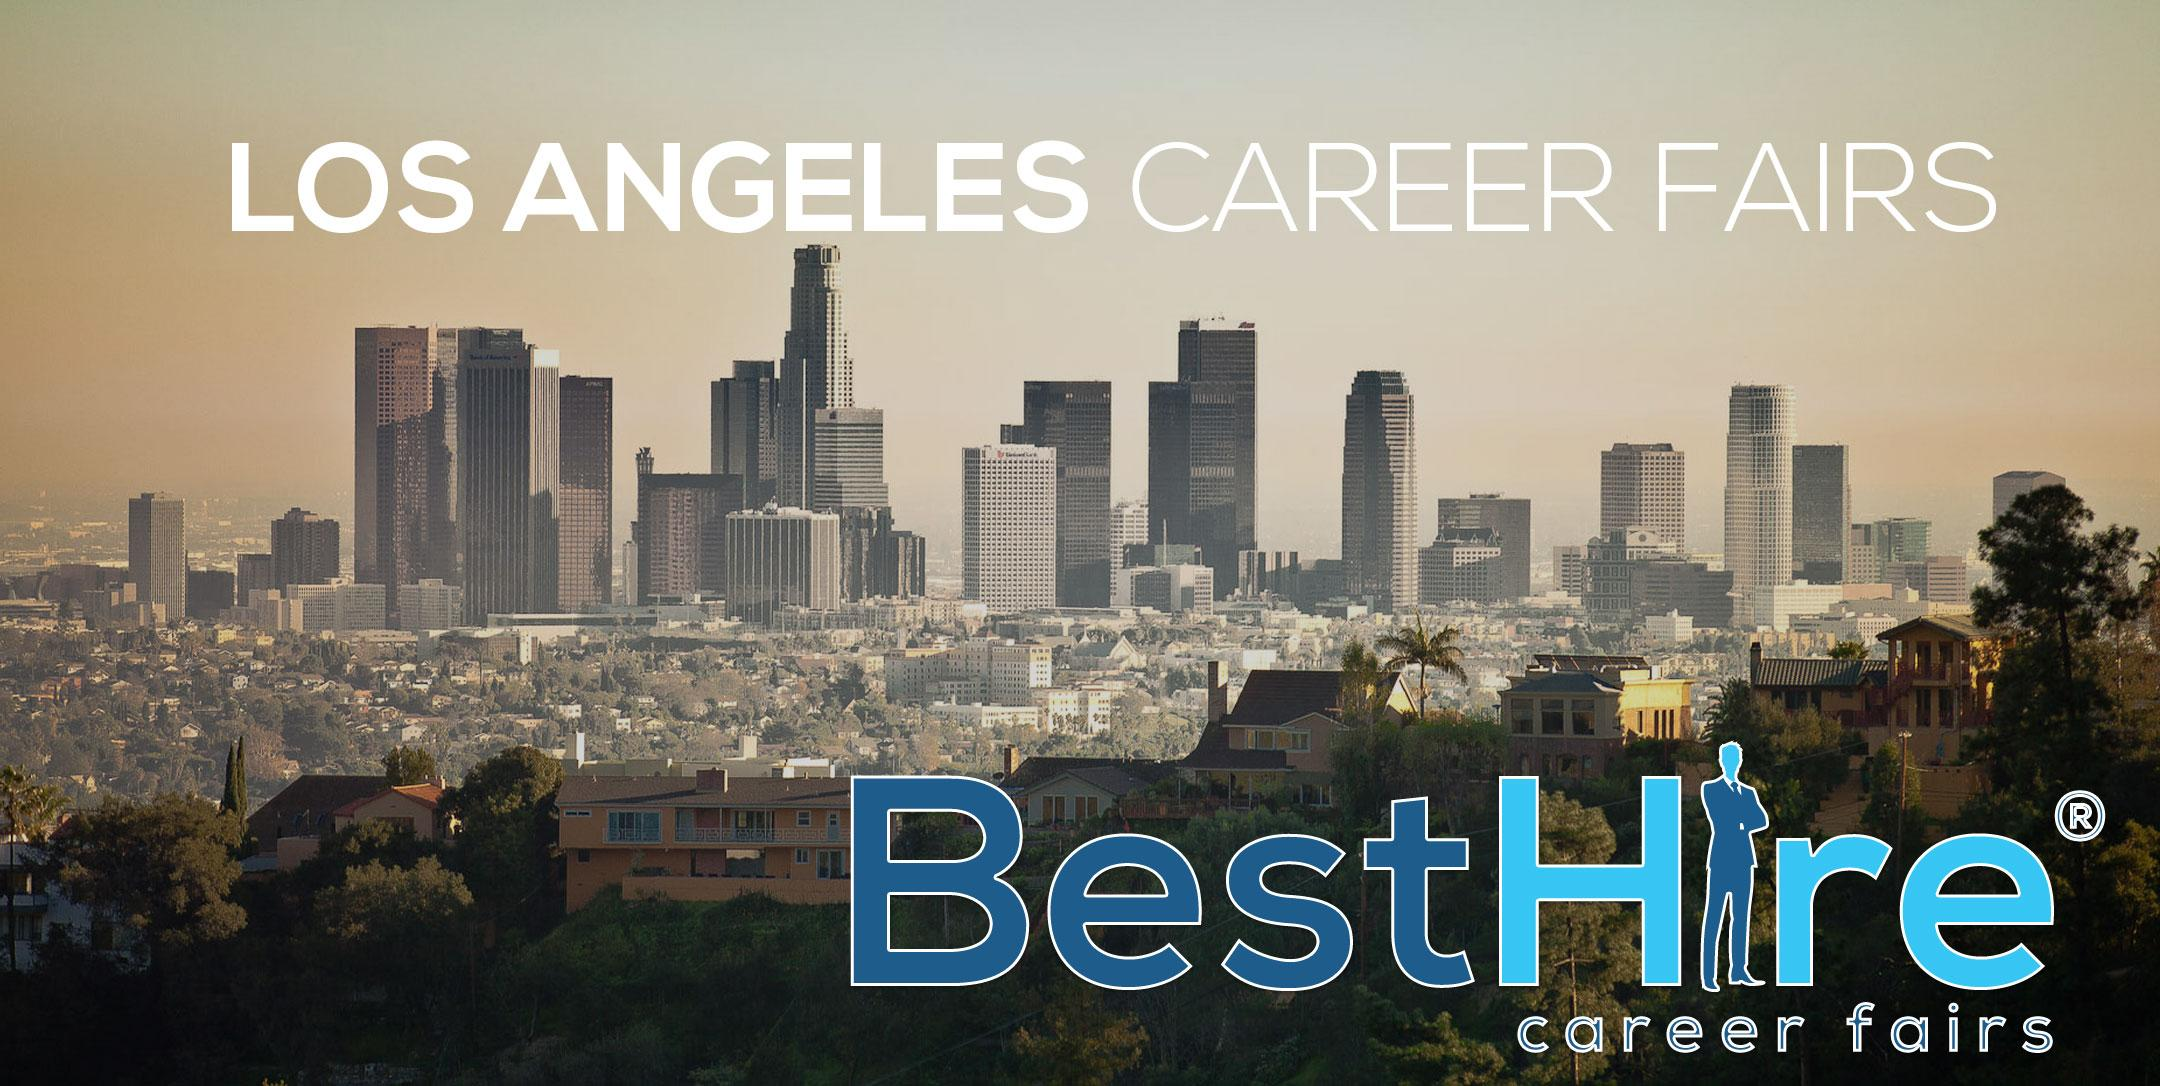 Los Angeles Career Fair - July 18, 2018 Job Fairs & Hiring Events in Los Angeles CA